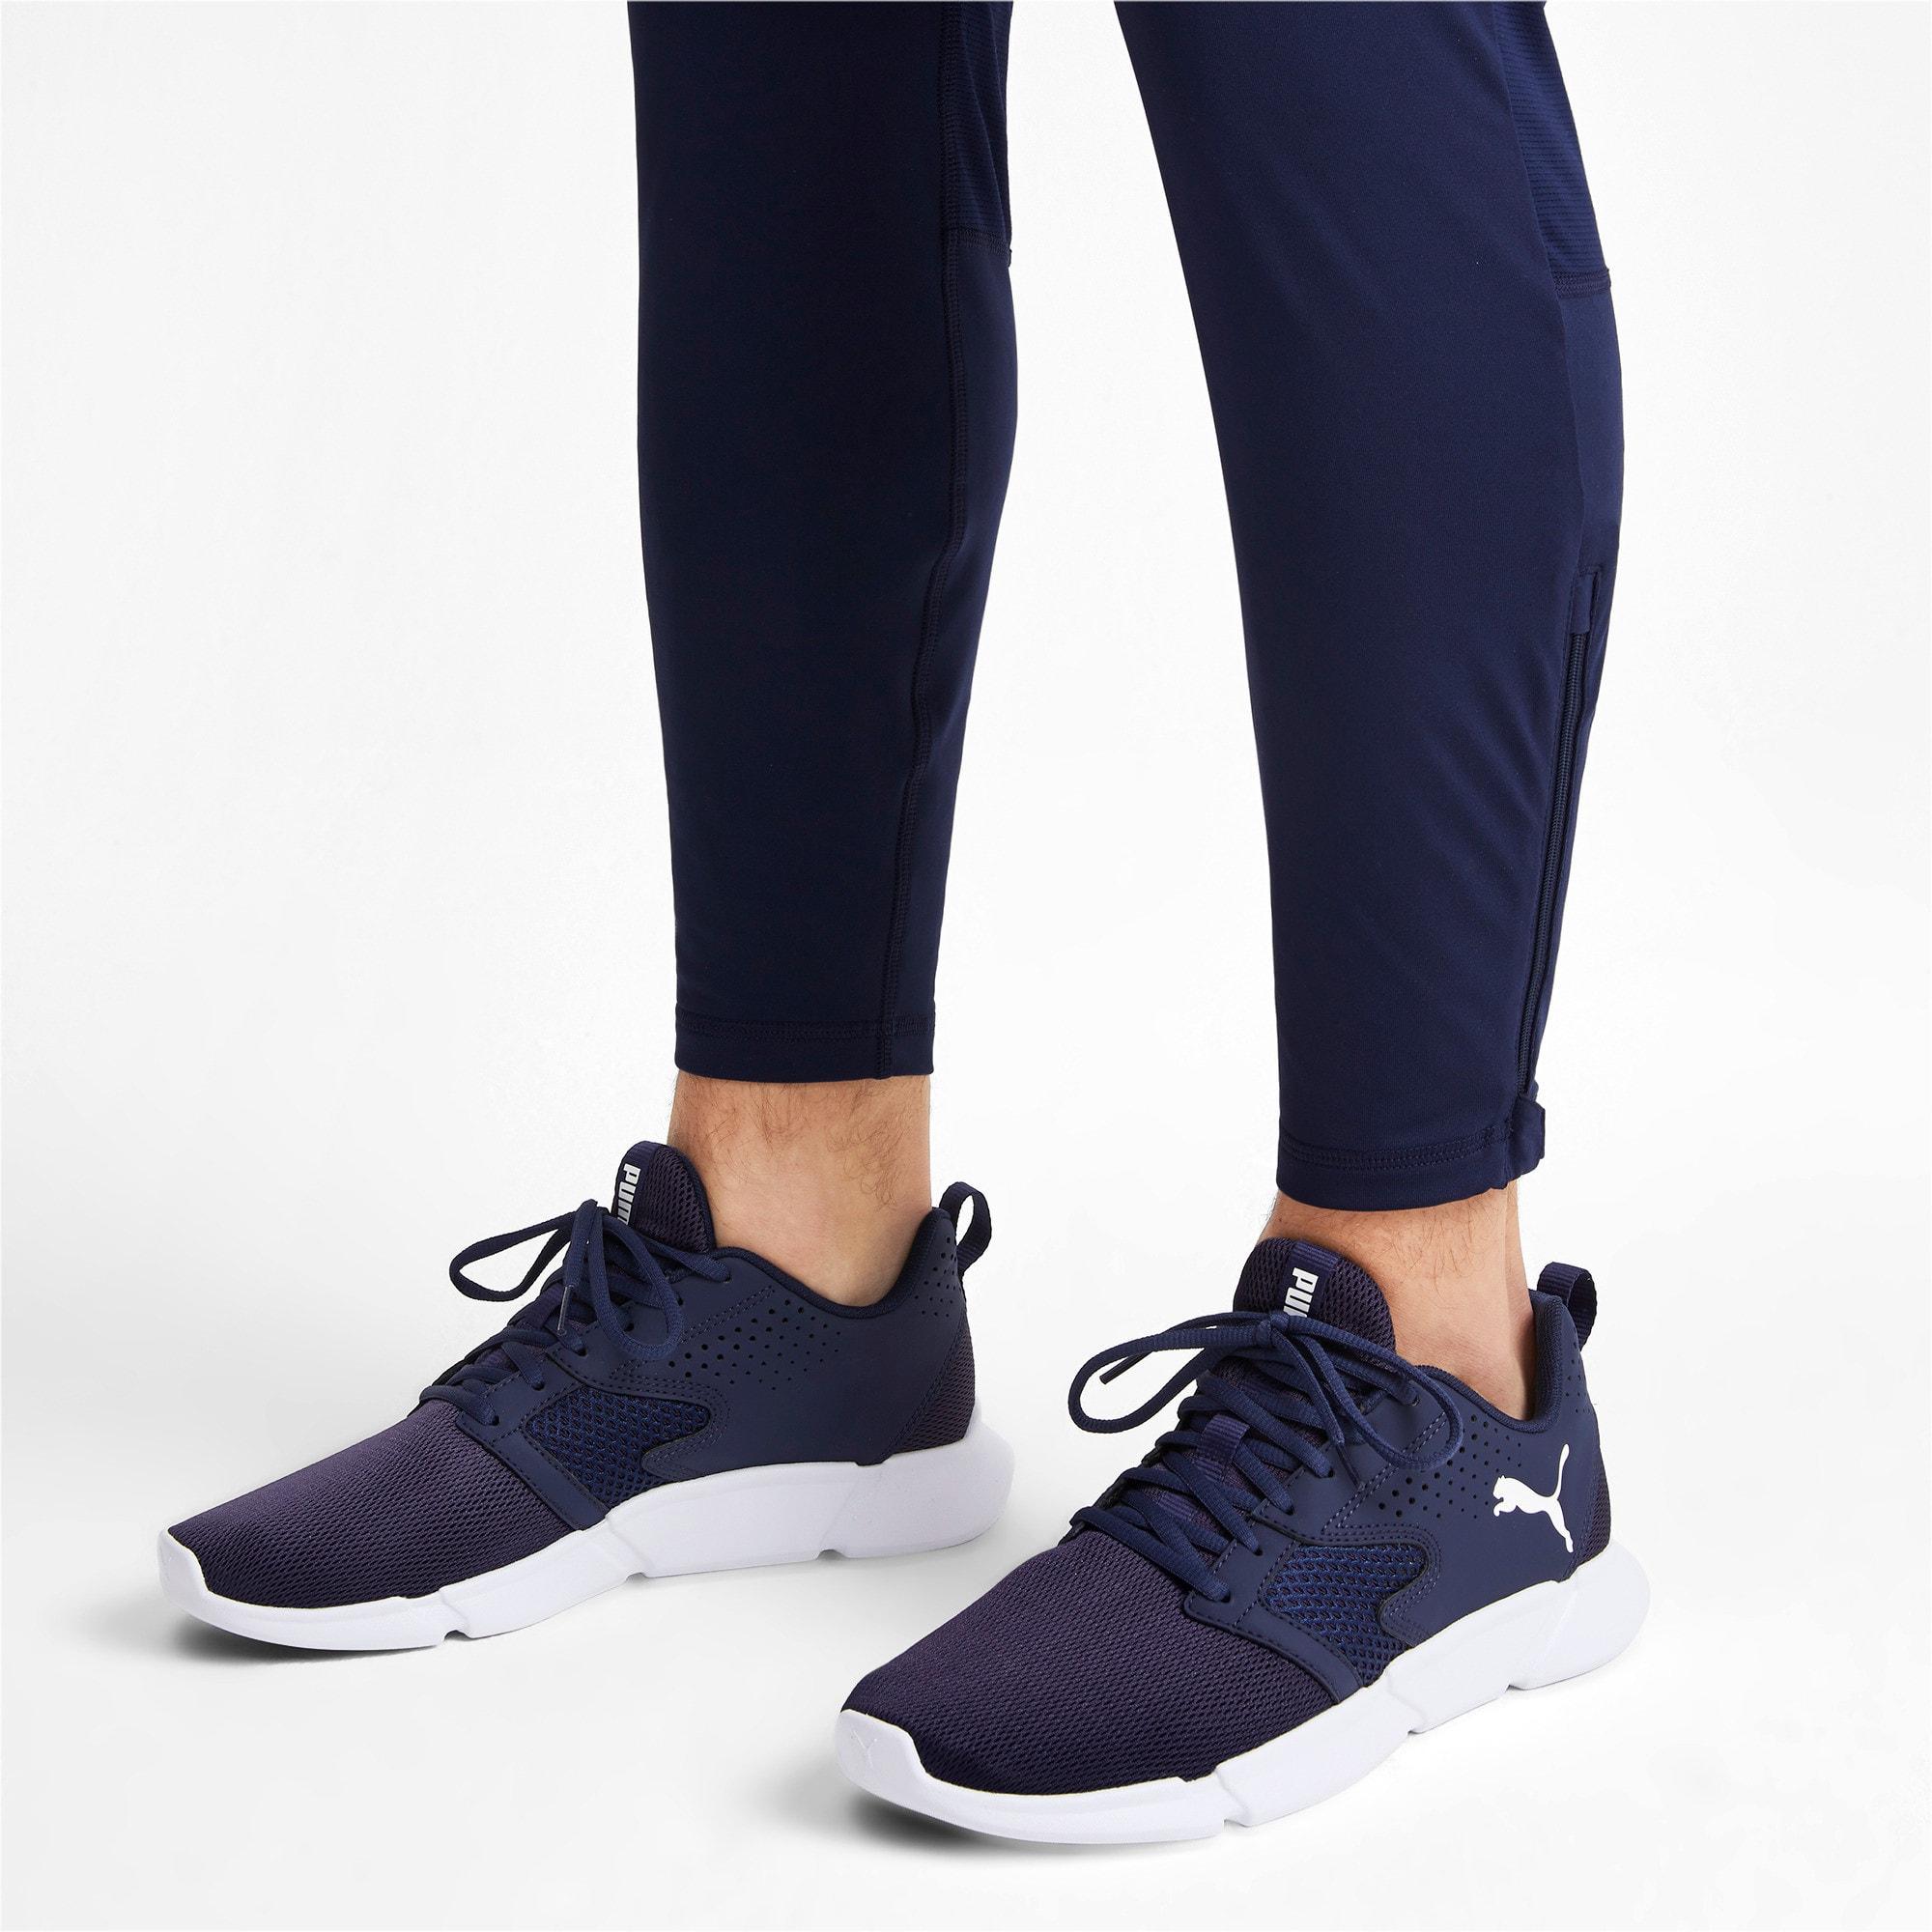 Thumbnail 2 of INTERFLEX Modern Running Shoes, Peacoat-Puma White, medium-IND